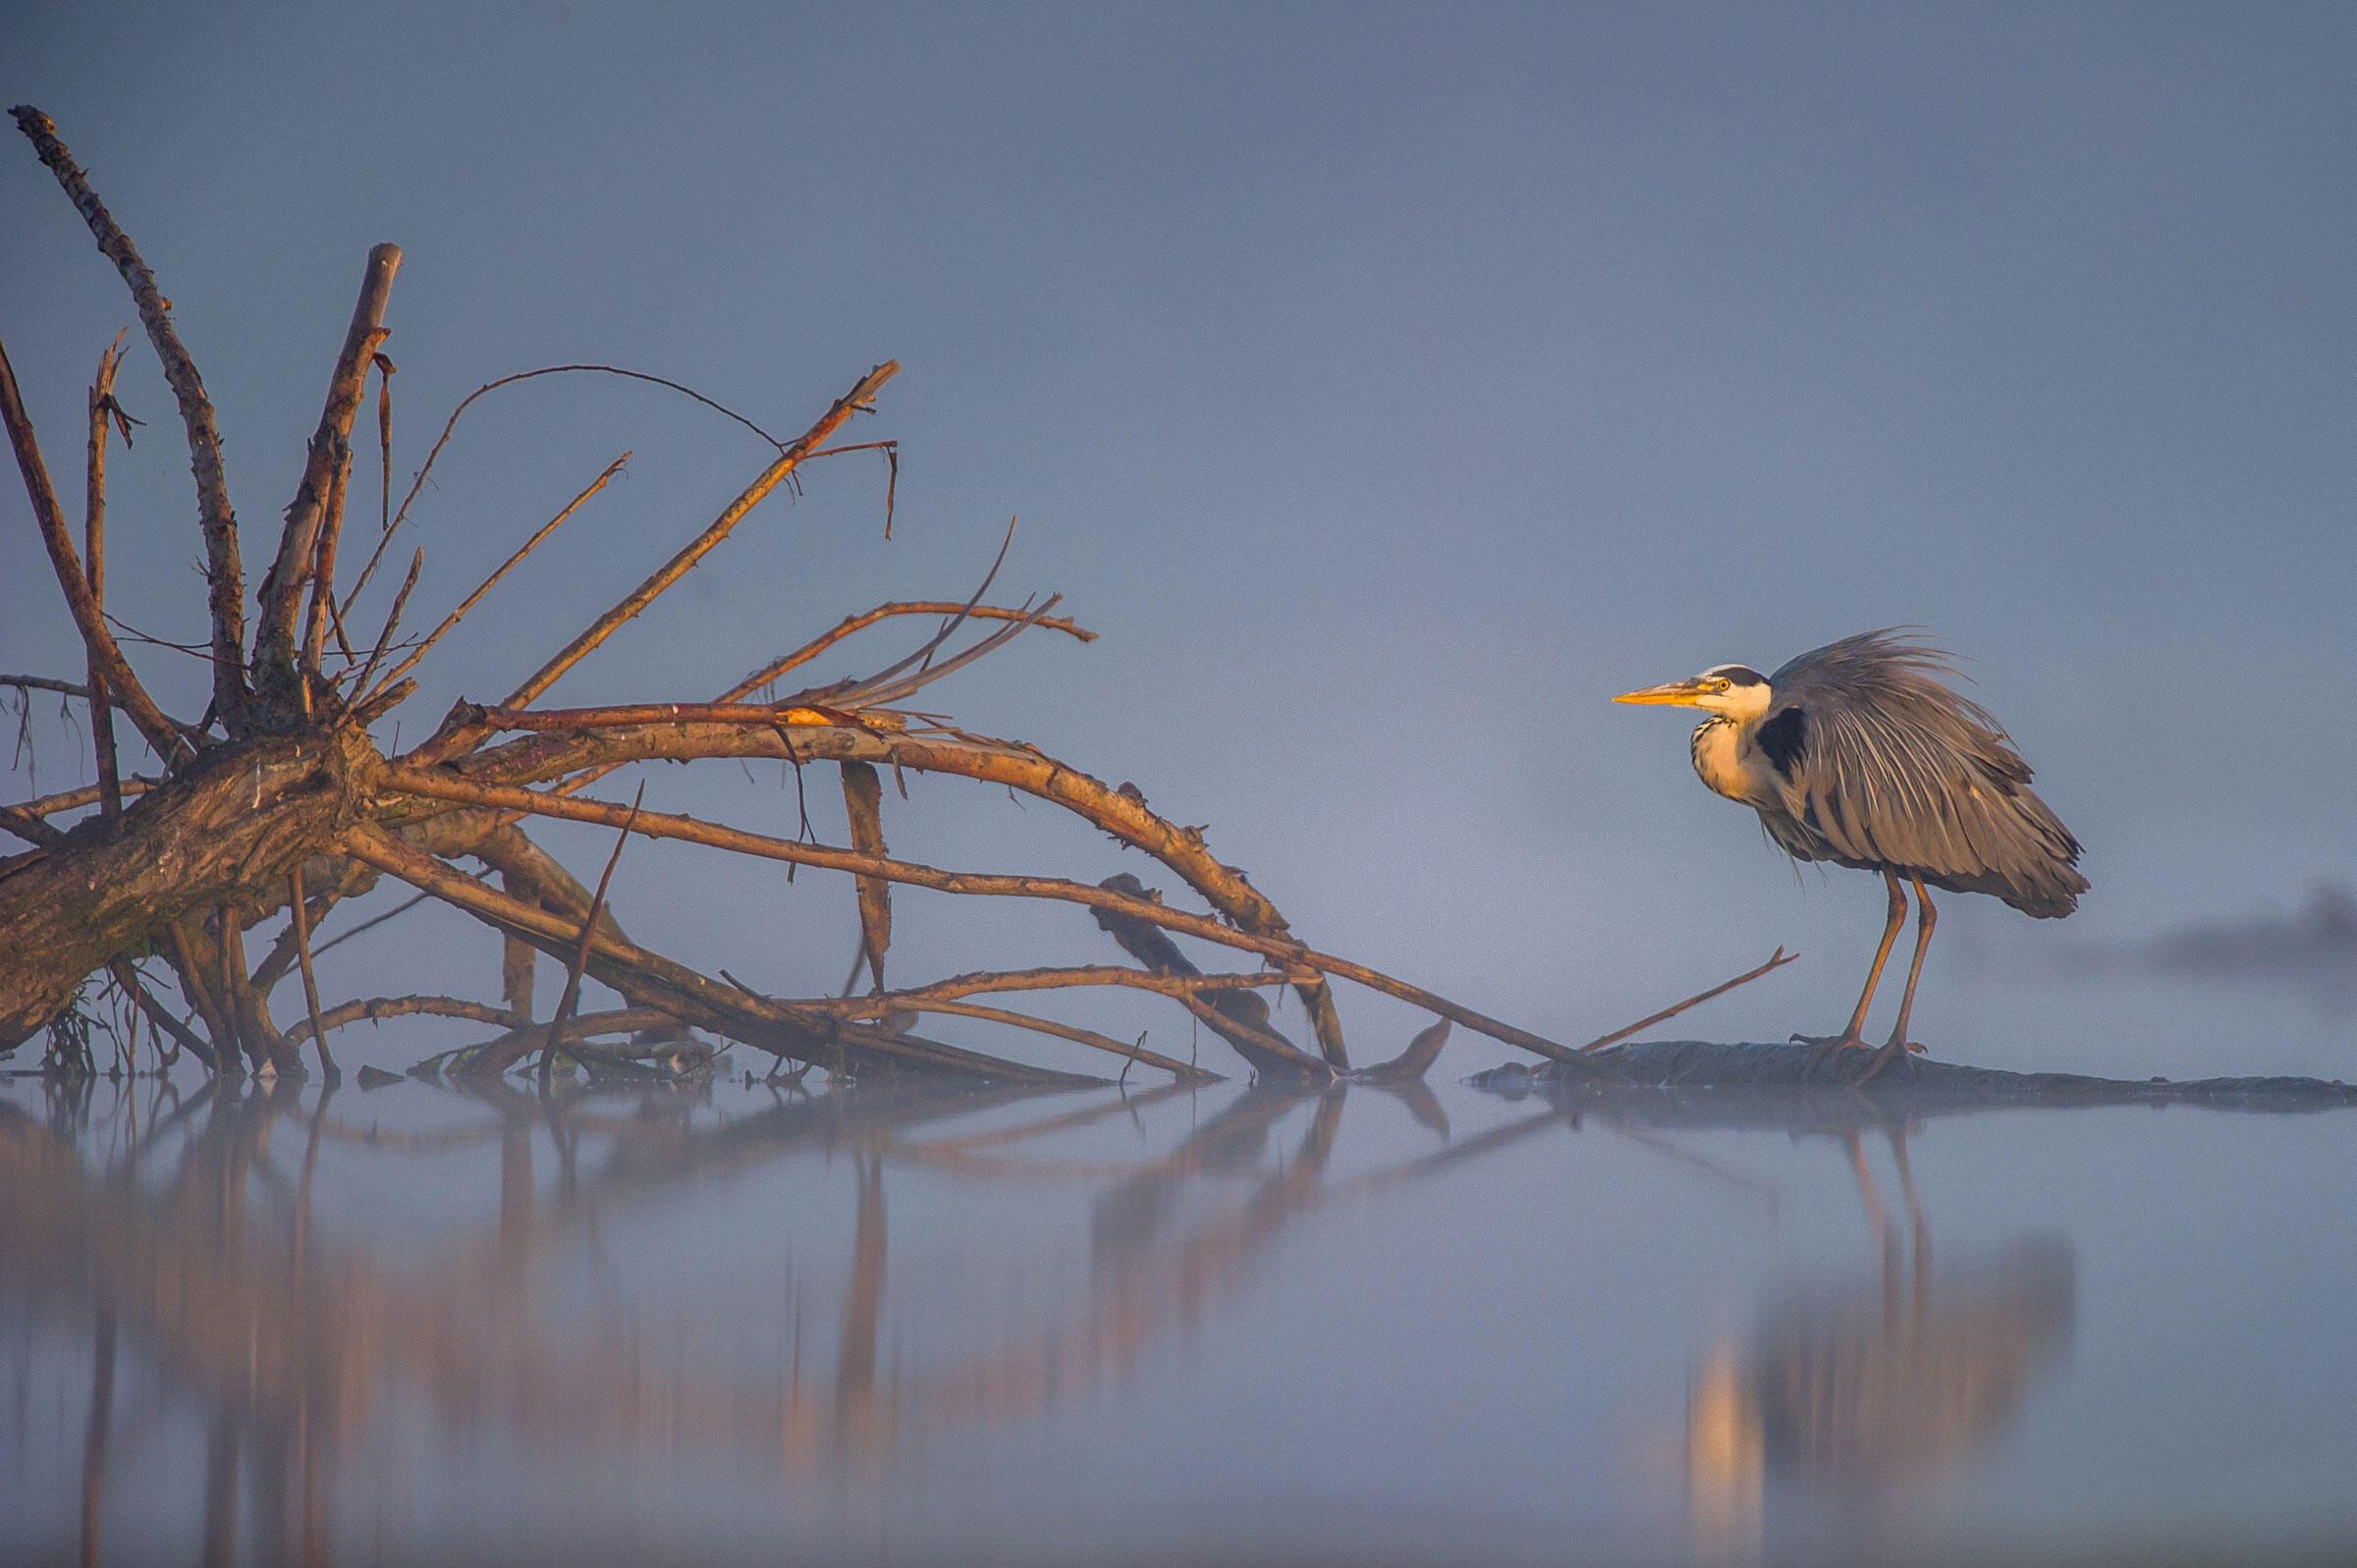 Grey Heron/Amateur Category. Artur Stankiewicz/Audubon Photography Awards